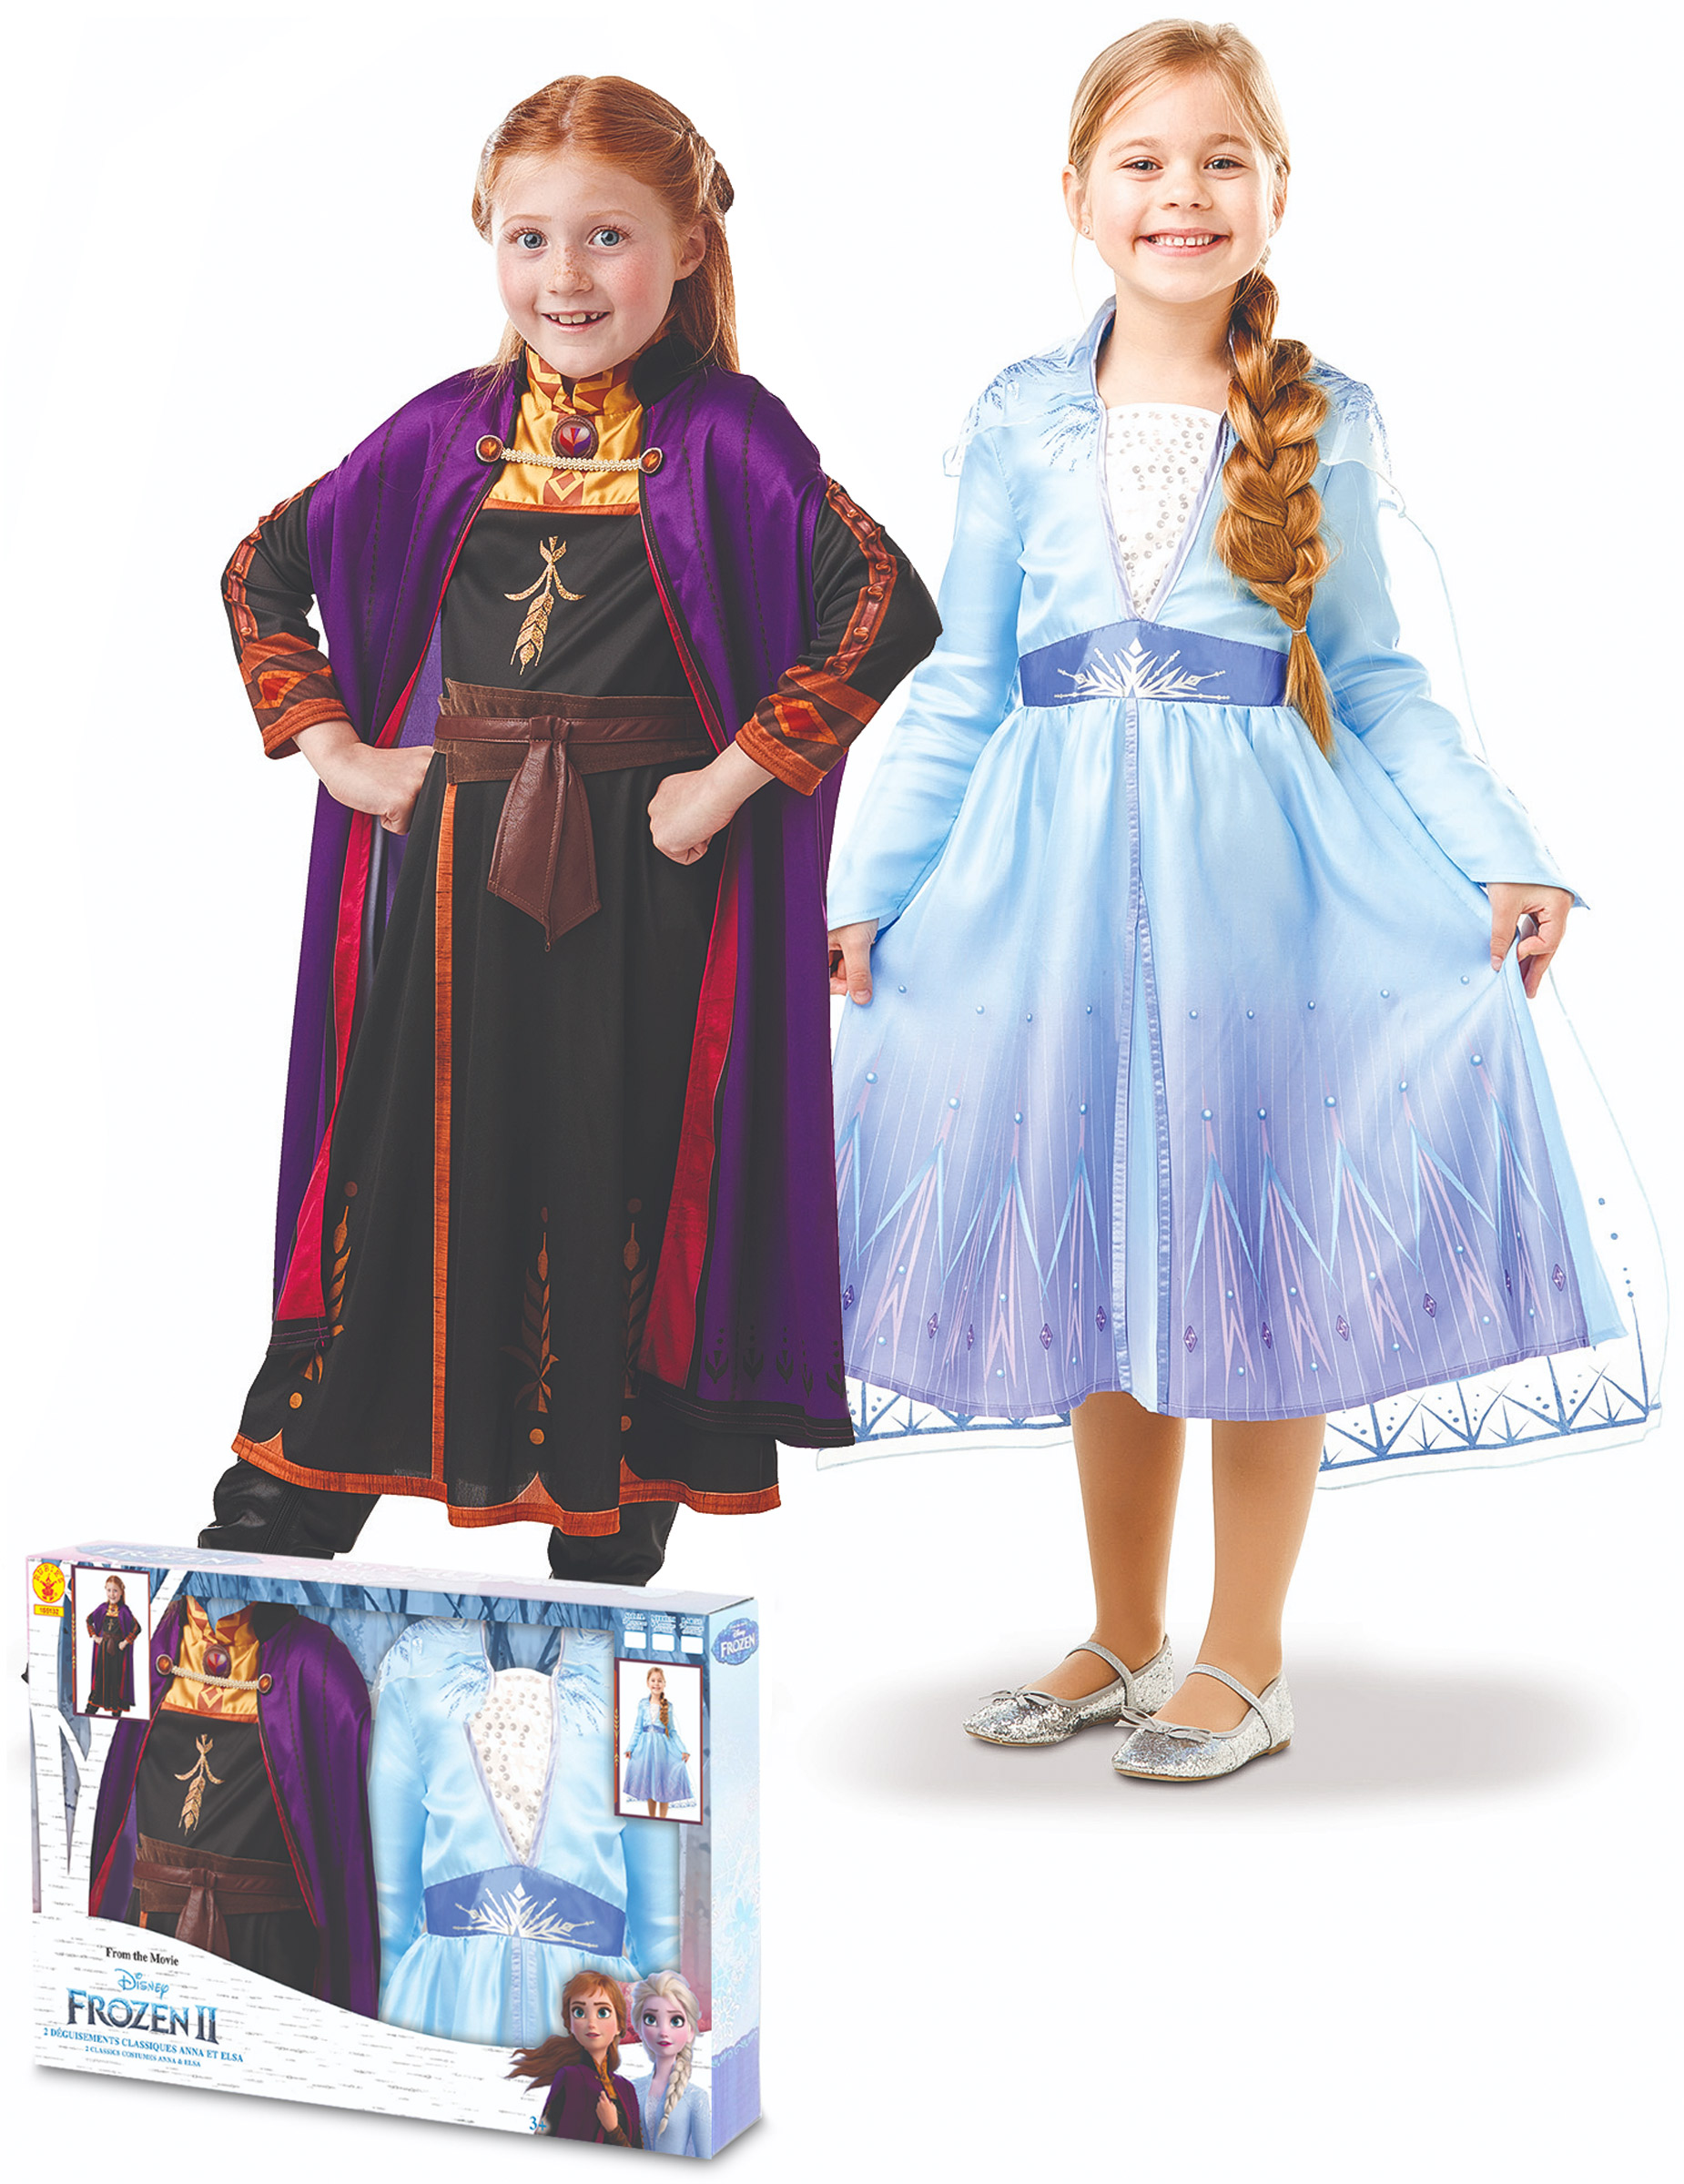 Bambini Costume Mantello e Maschera Frozen Principesse Anna Elsa Costume